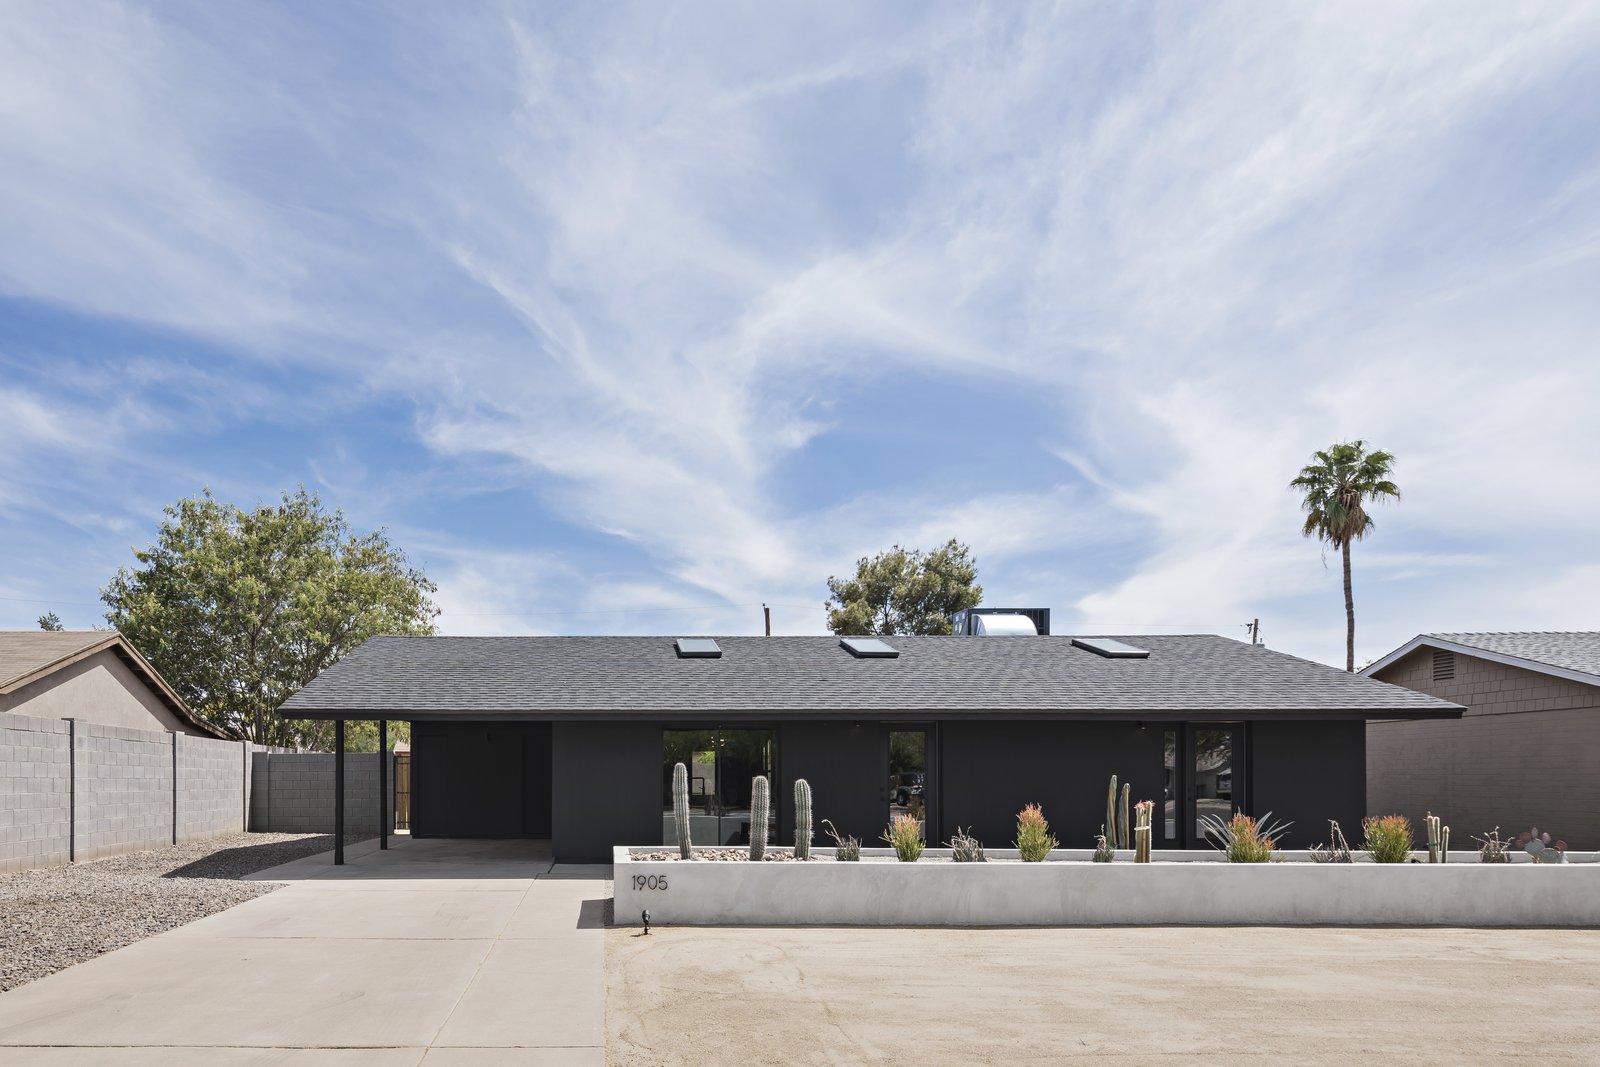 The Black House Knob Modern Design exterior